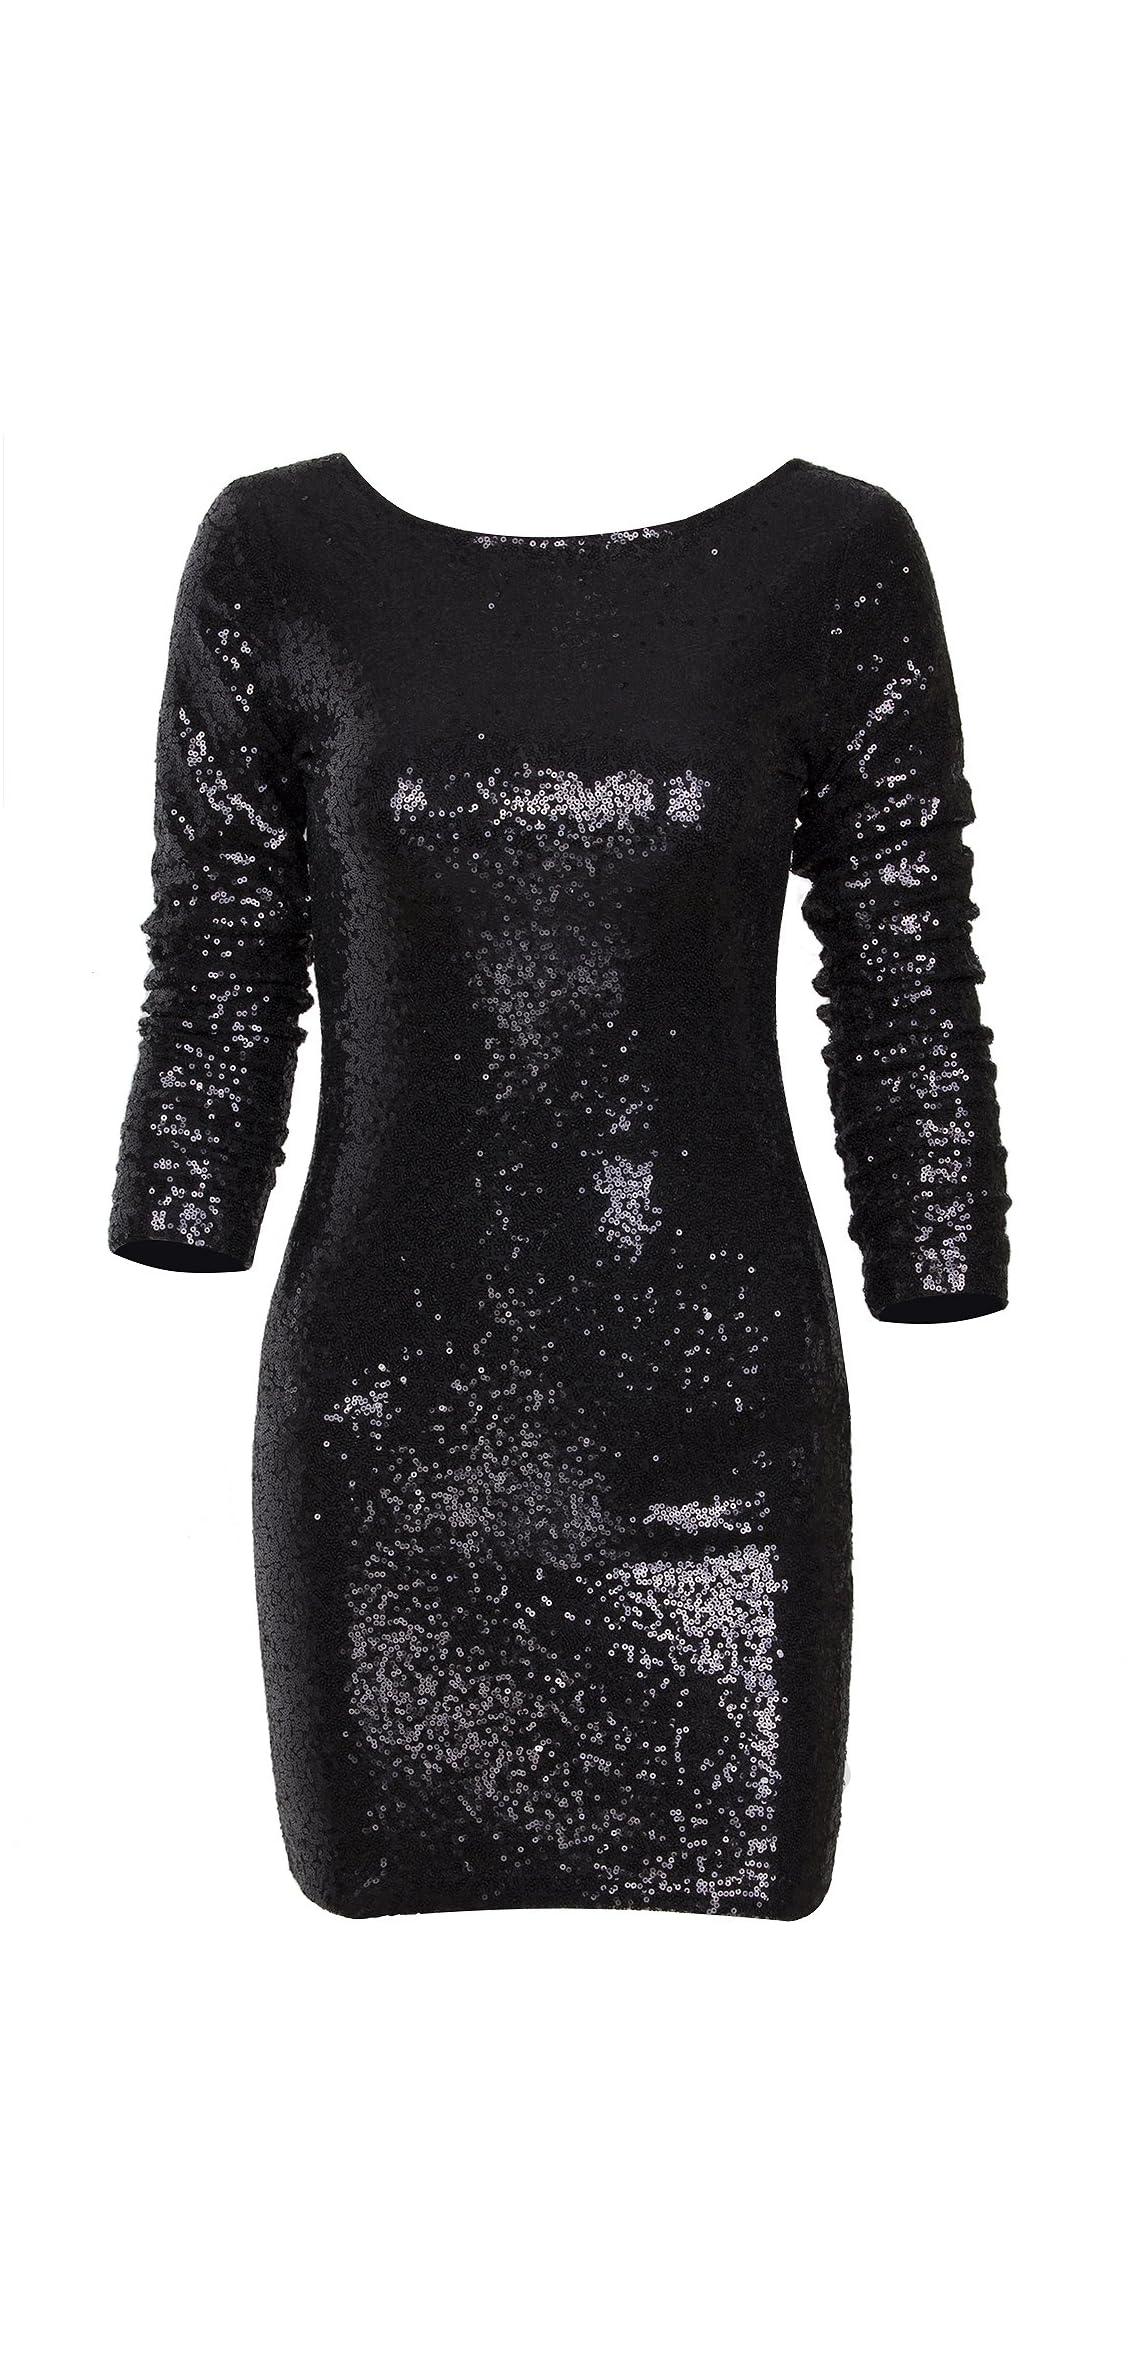 Women's Sparkle Glitzy Glam Sequin Long Sleeve Flapper